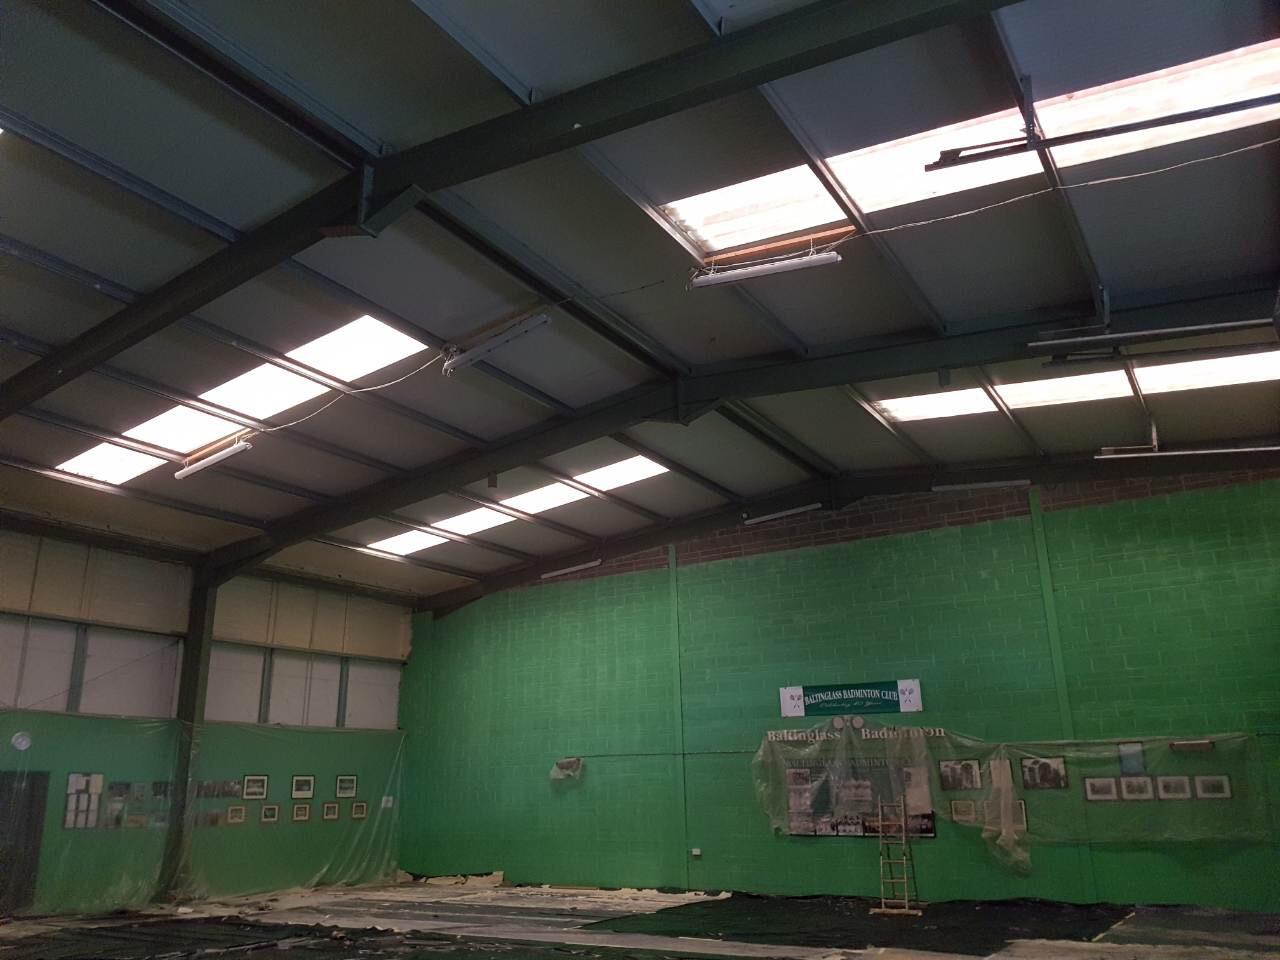 baltinglass badminton court spray foam insulation